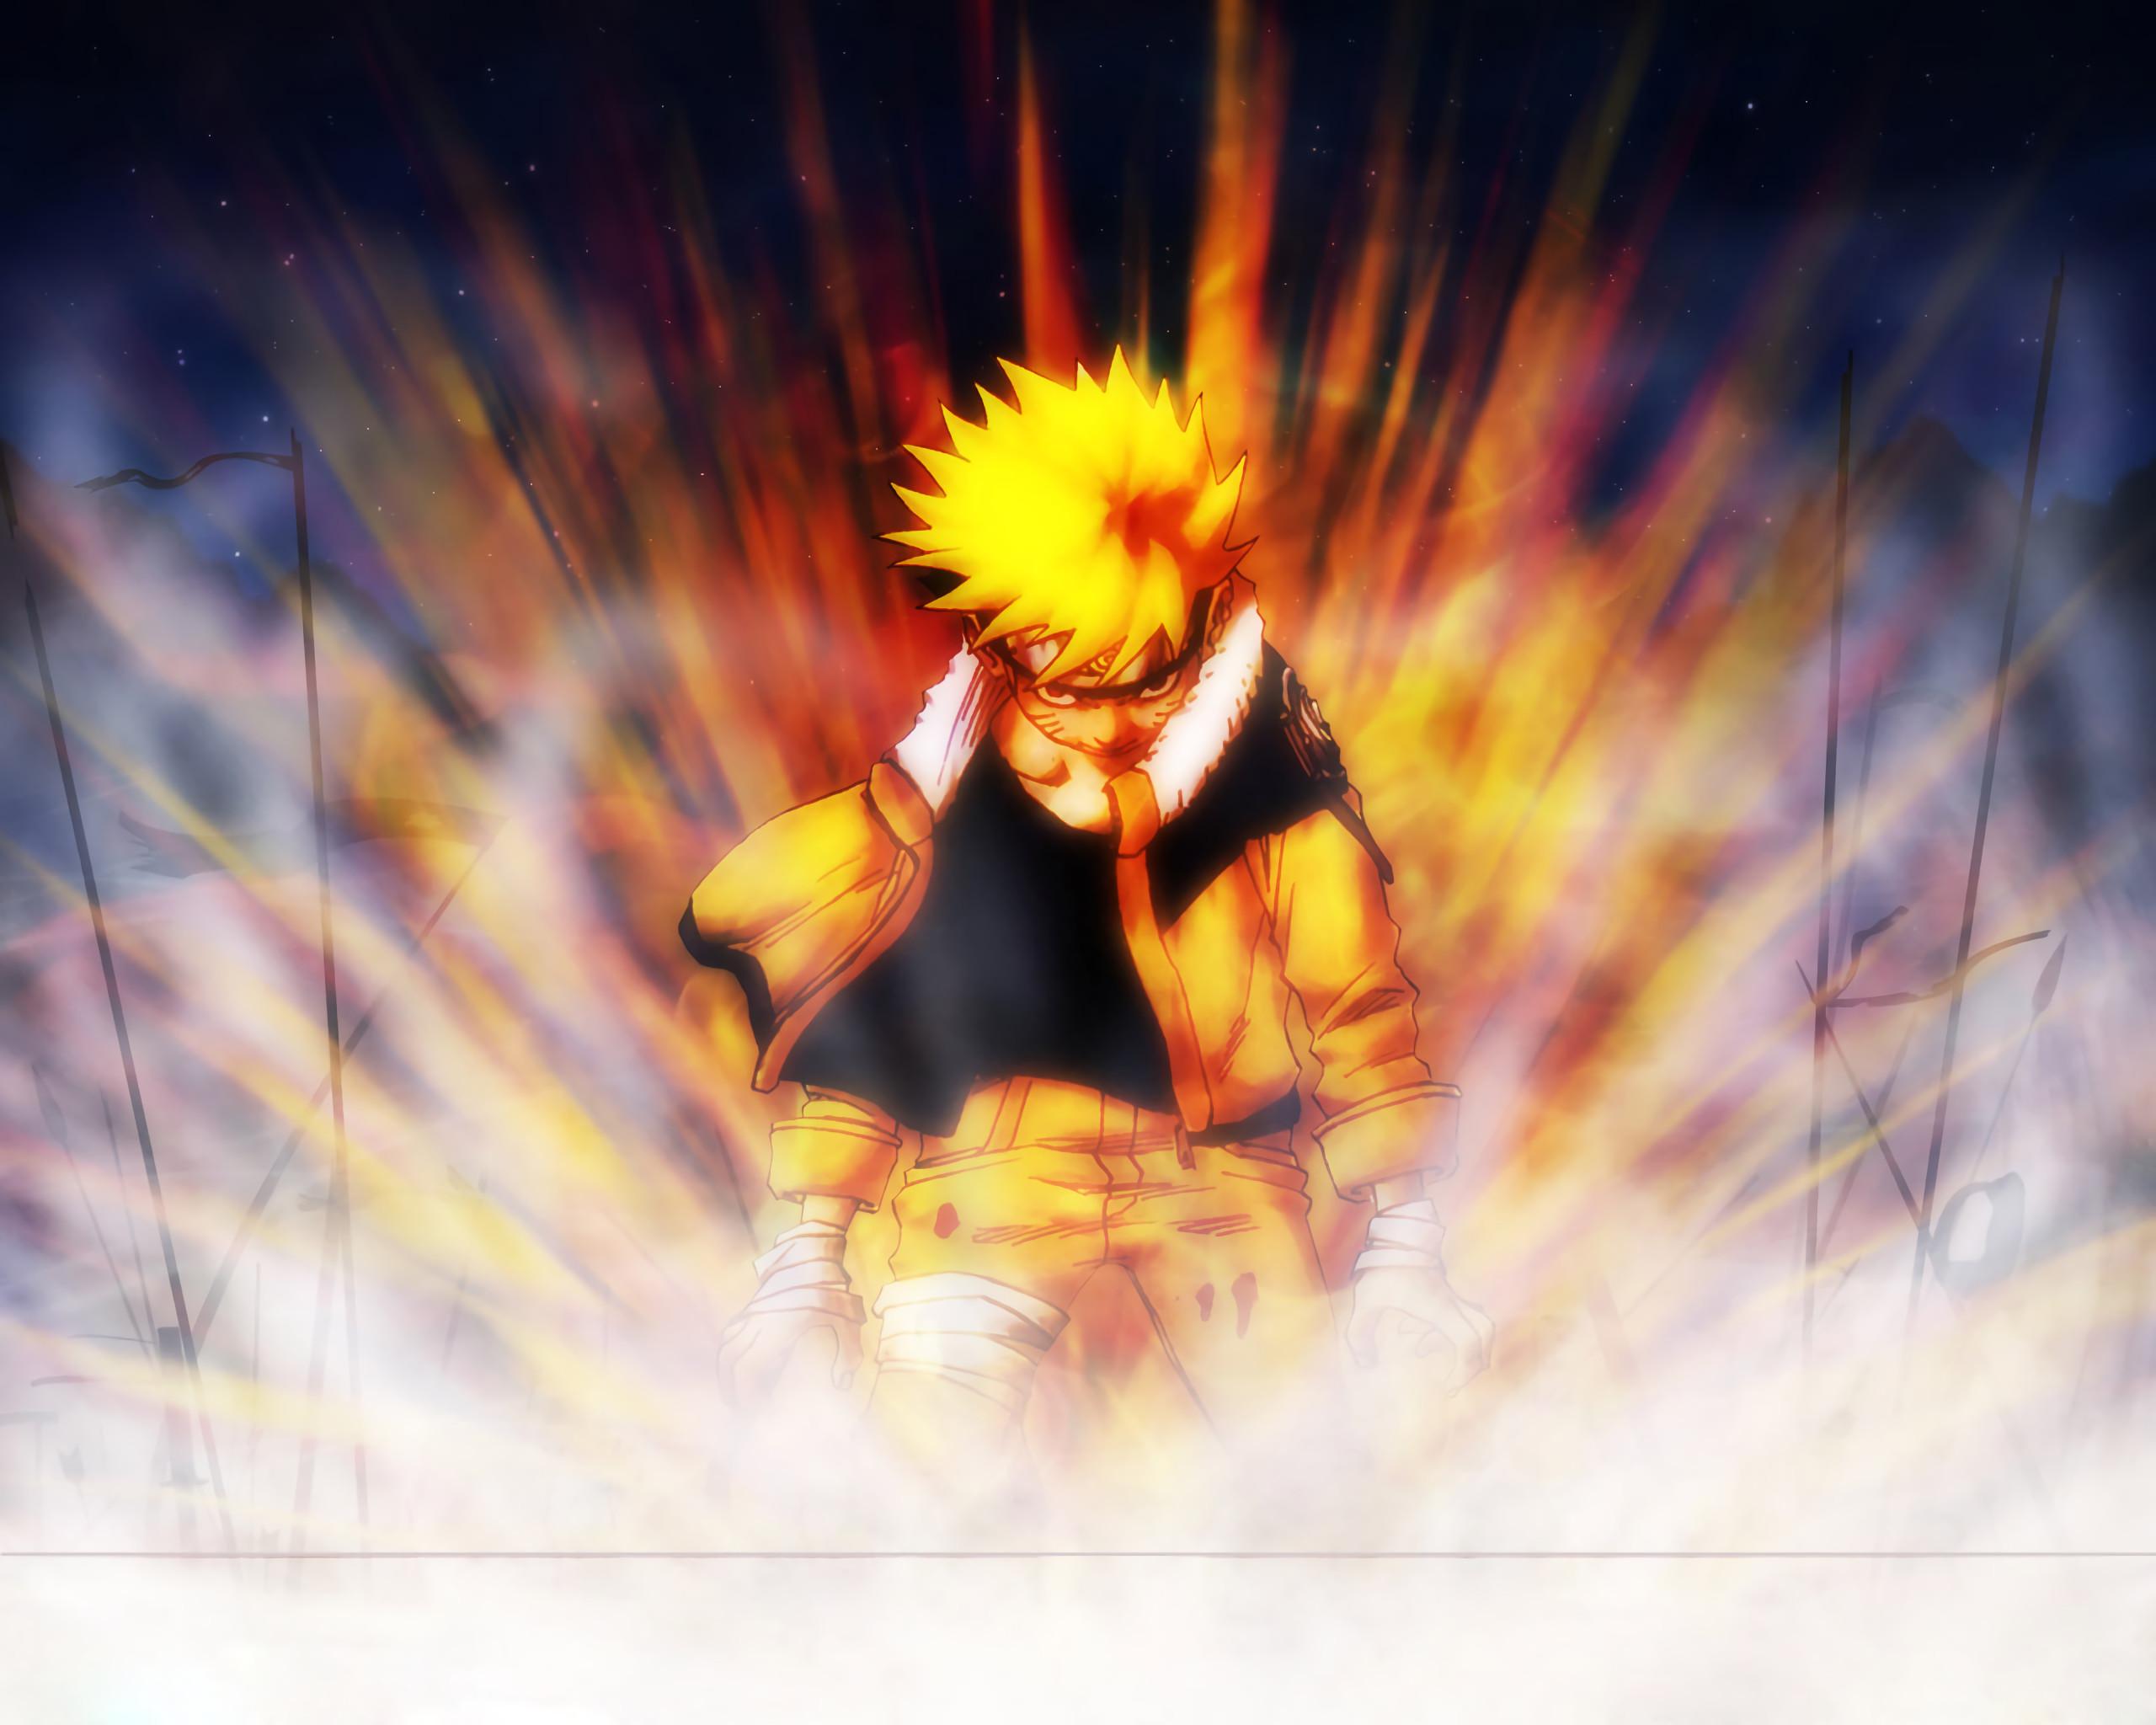 Naruto And Kurama Wallpapers 73 Images